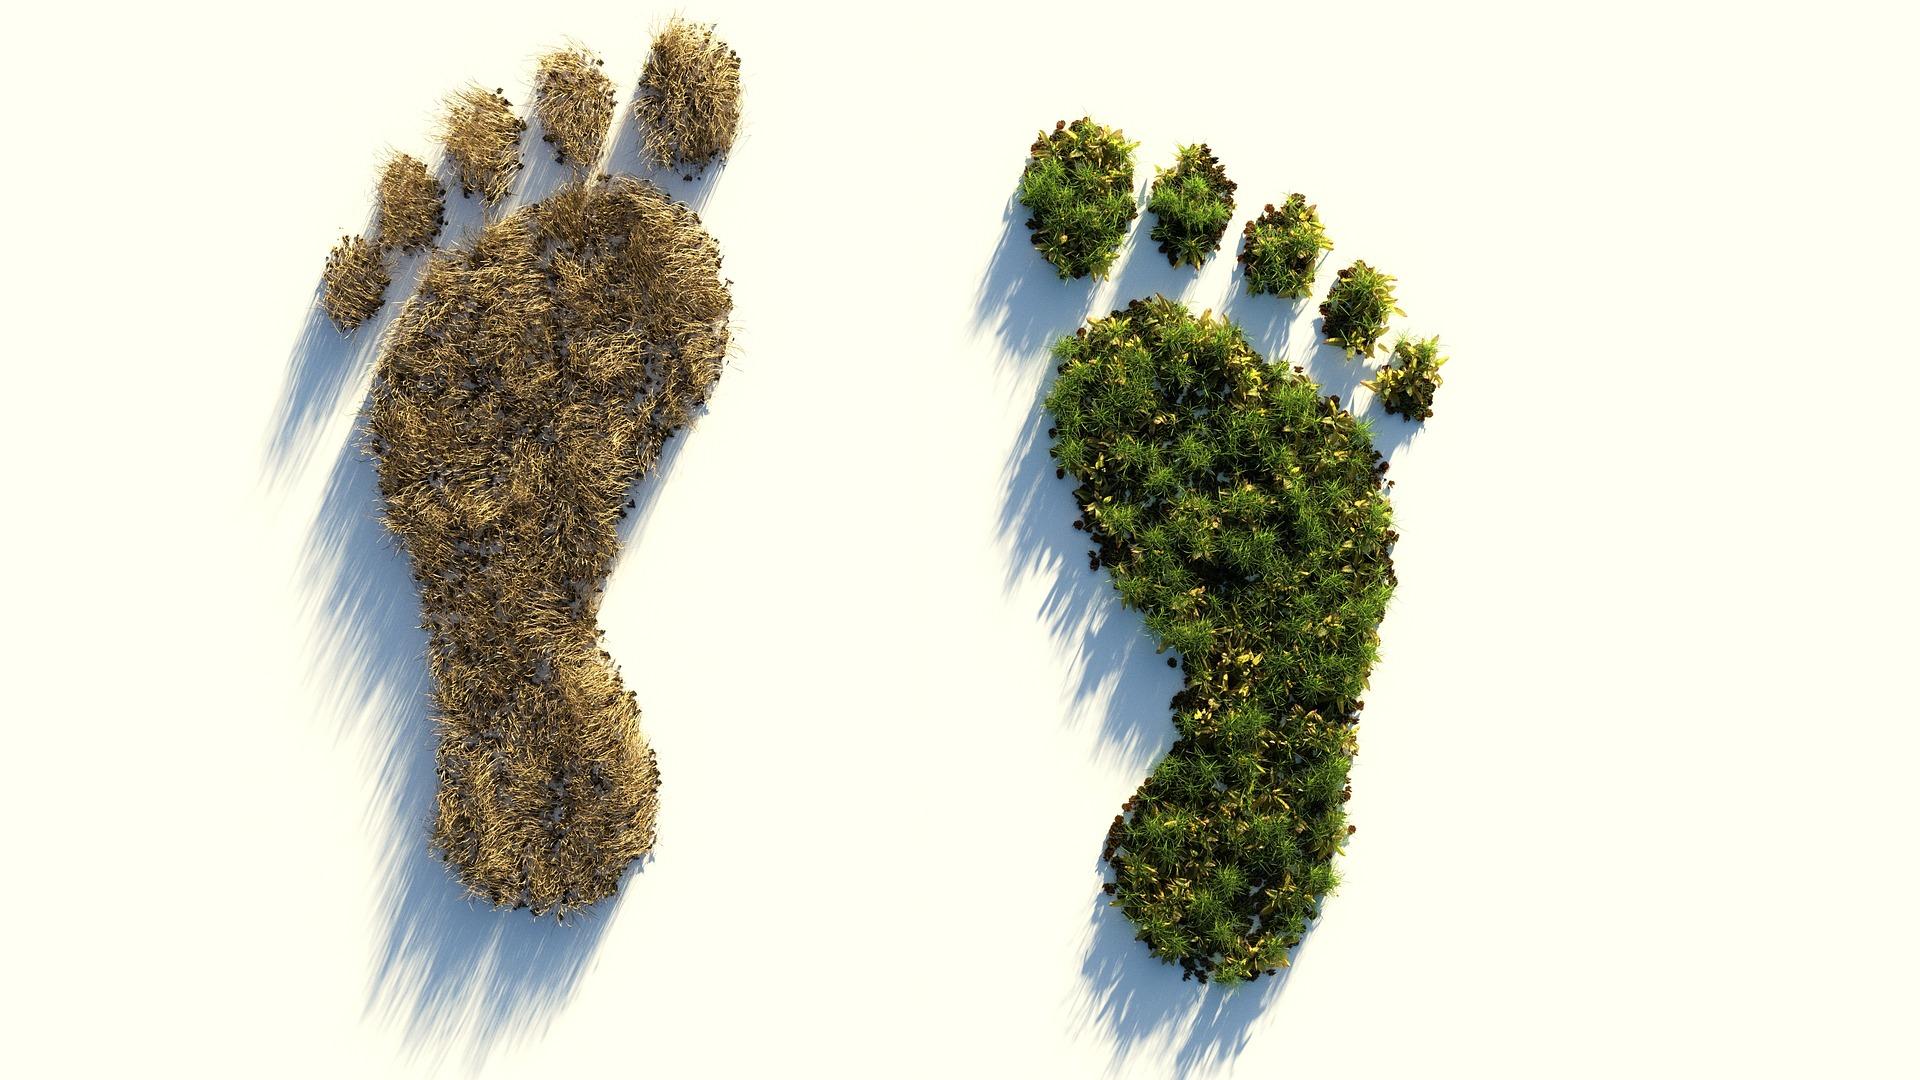 ecological-footprint-4123696_1920.jpg